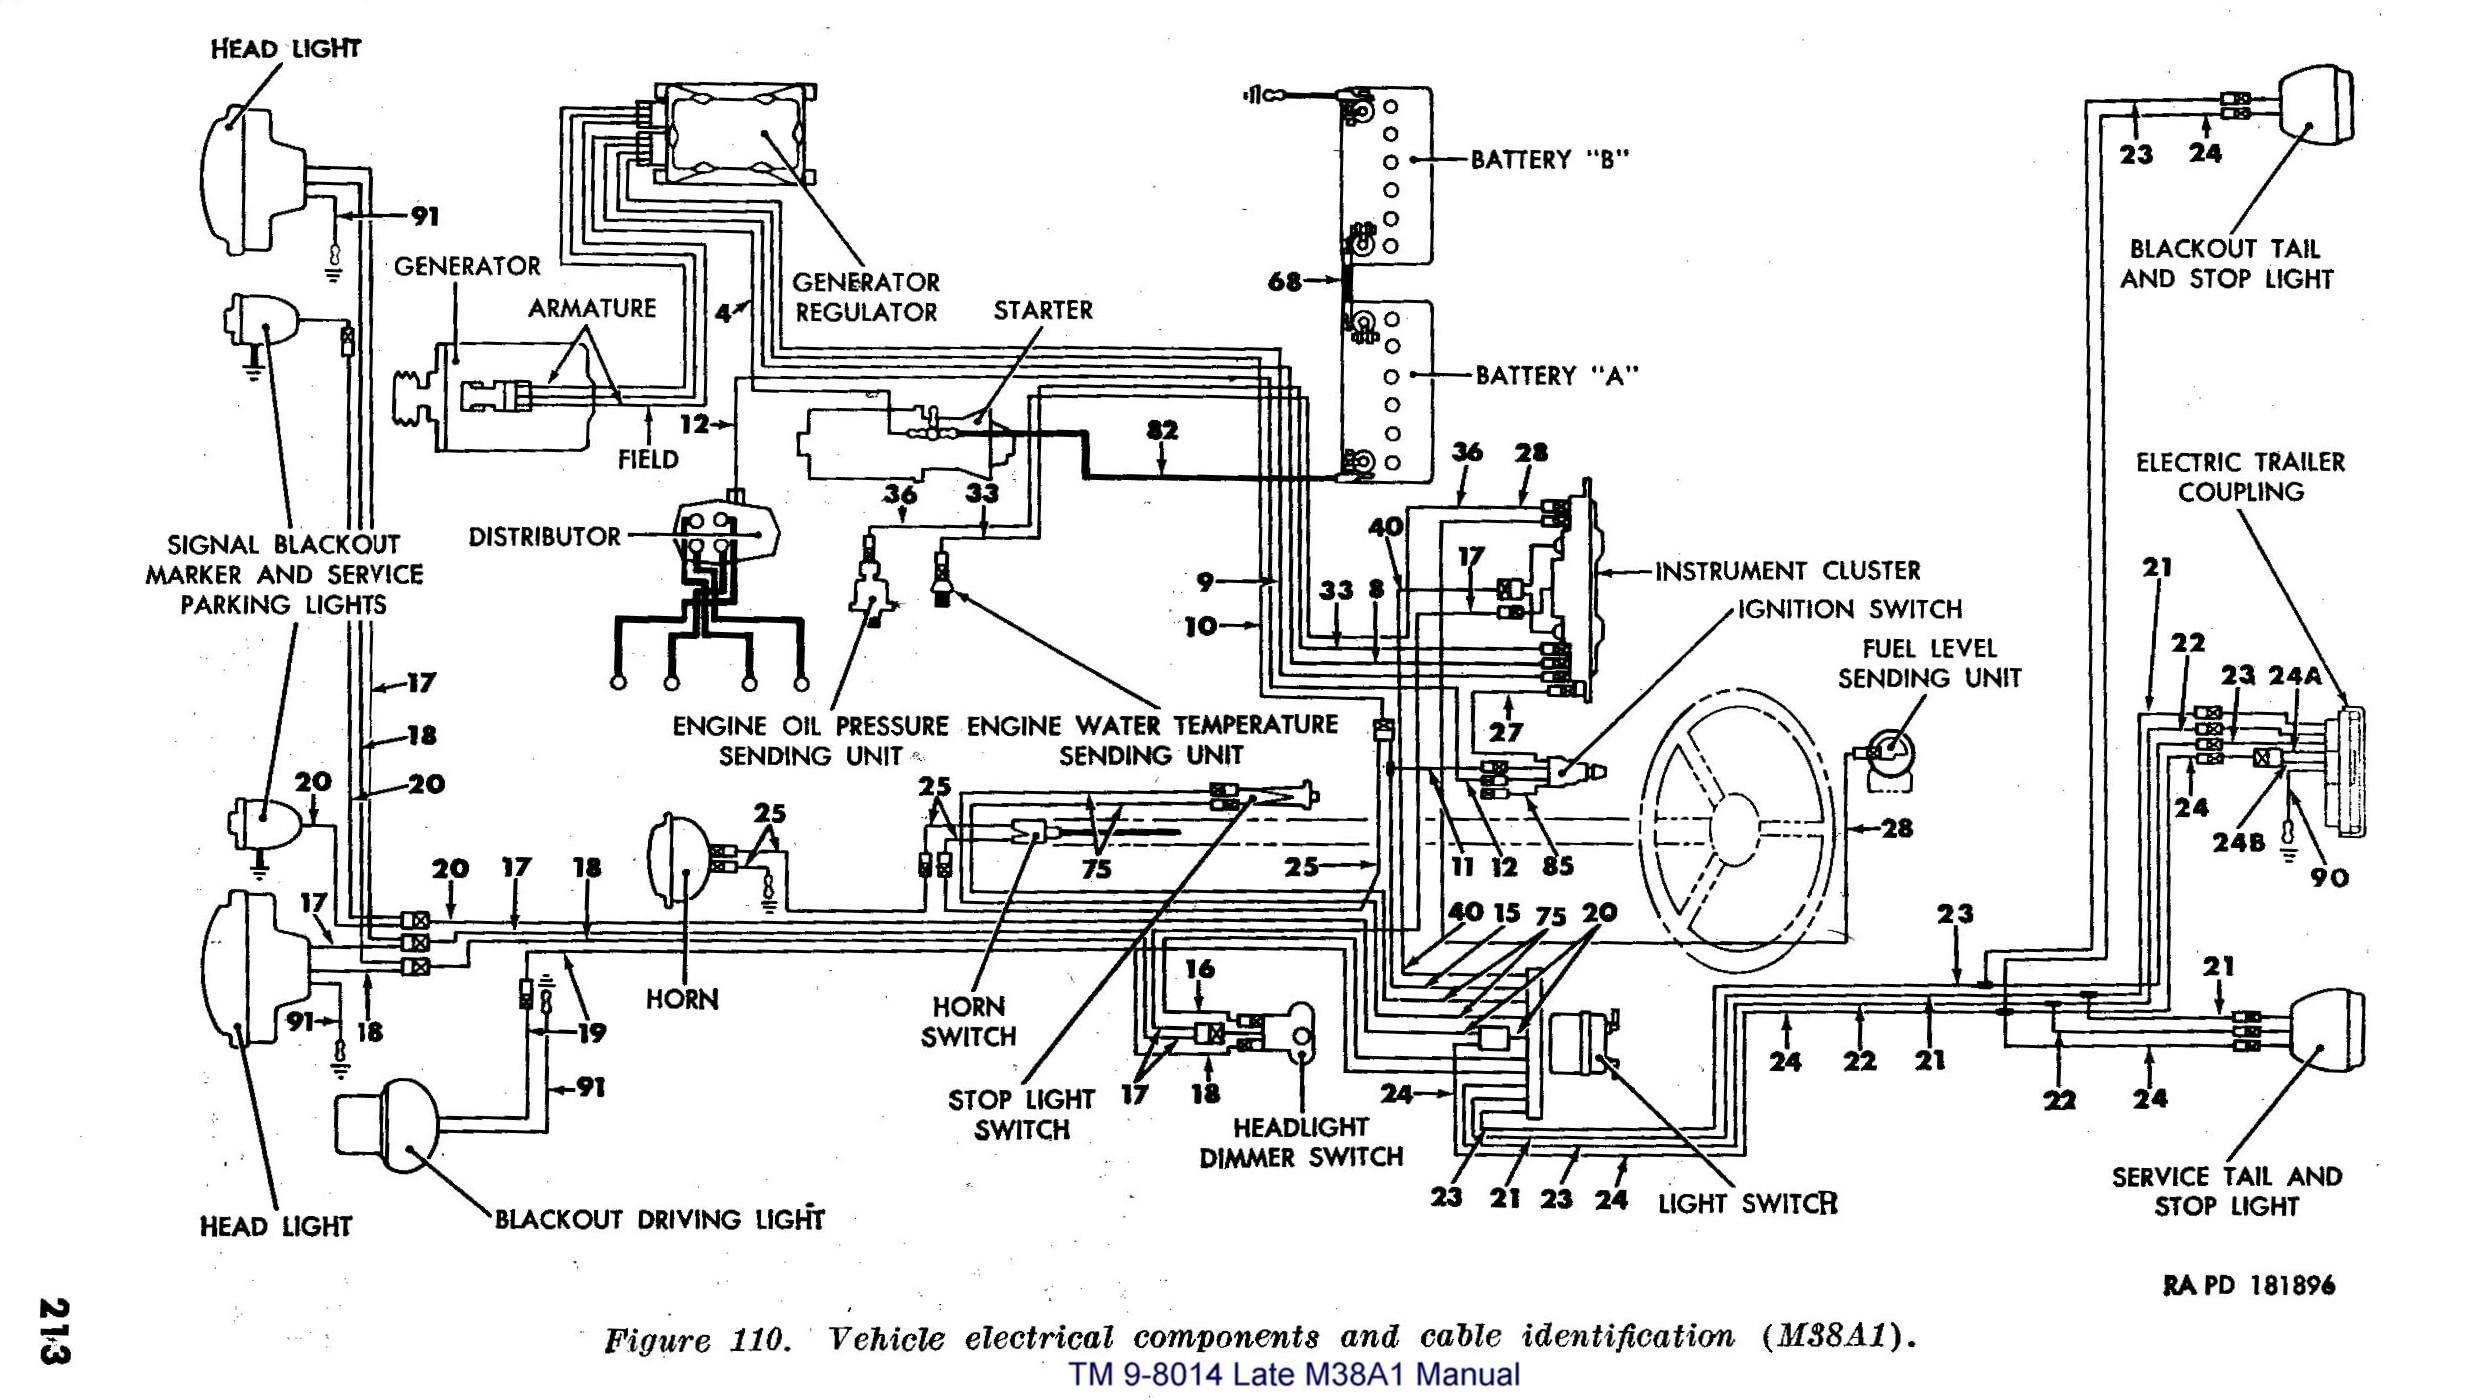 1953 m38a1 wiring diagram